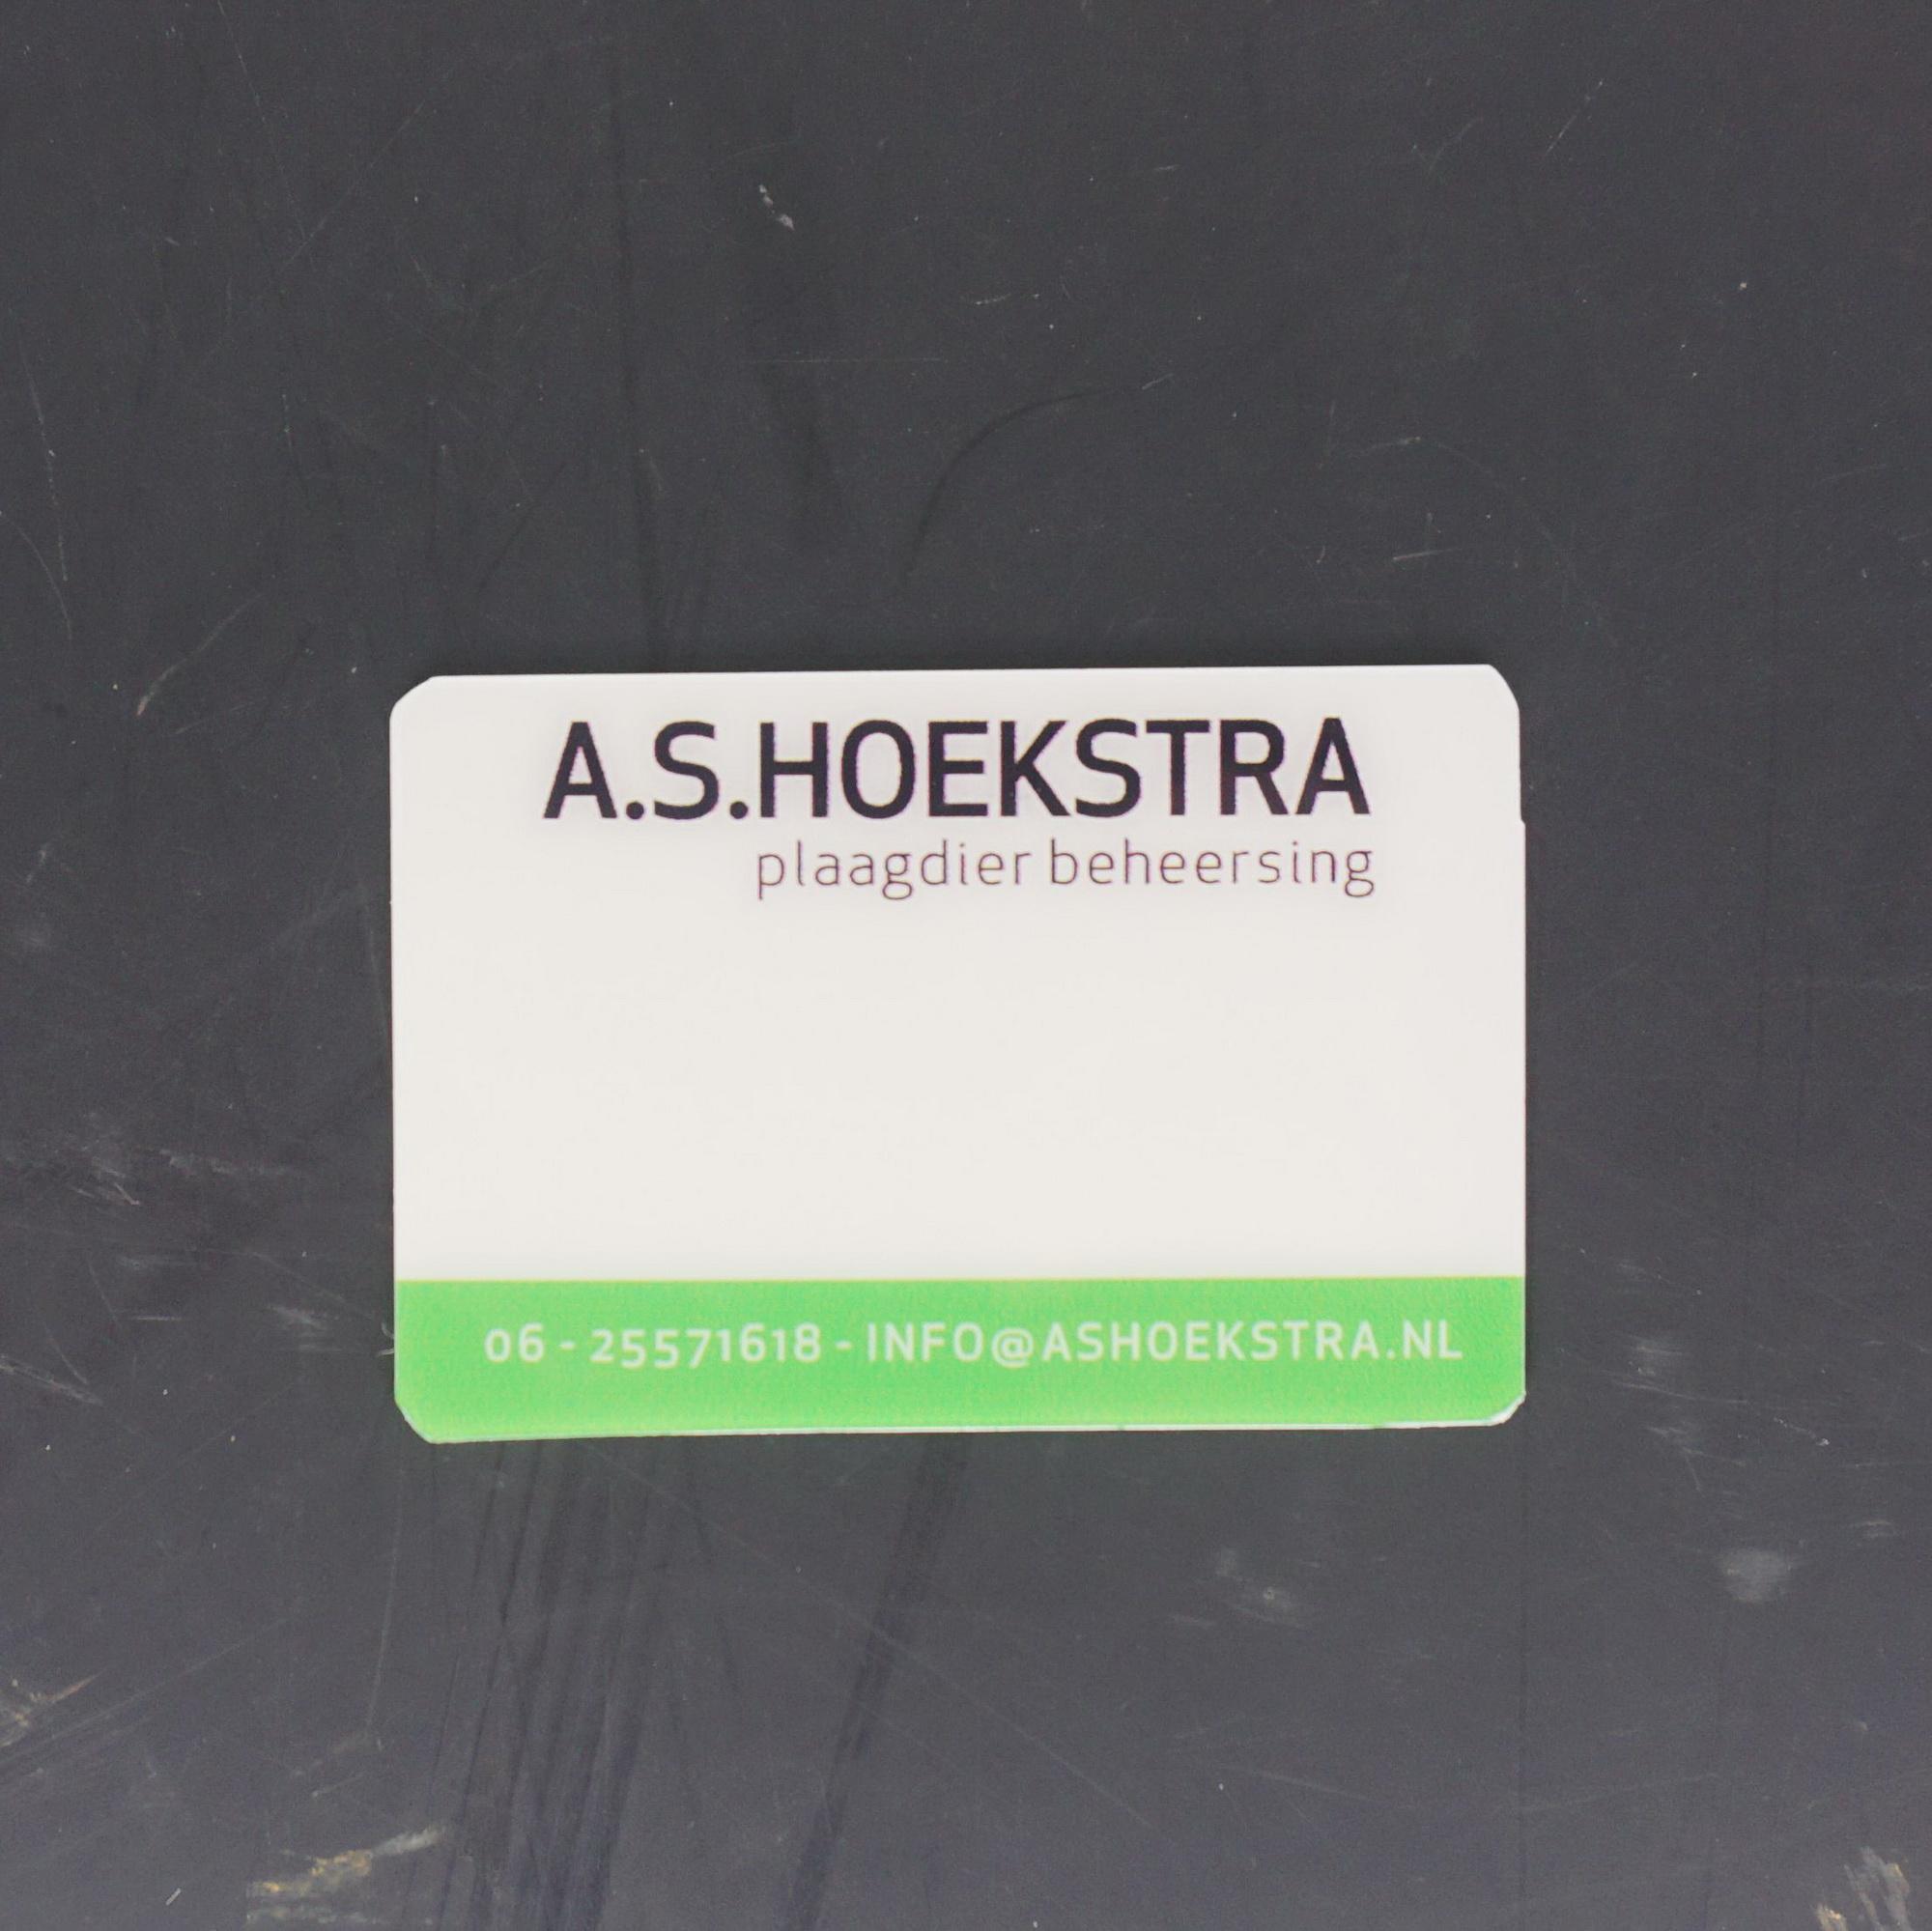 Flightcaselabels Caselabels Arnold Hoekstra